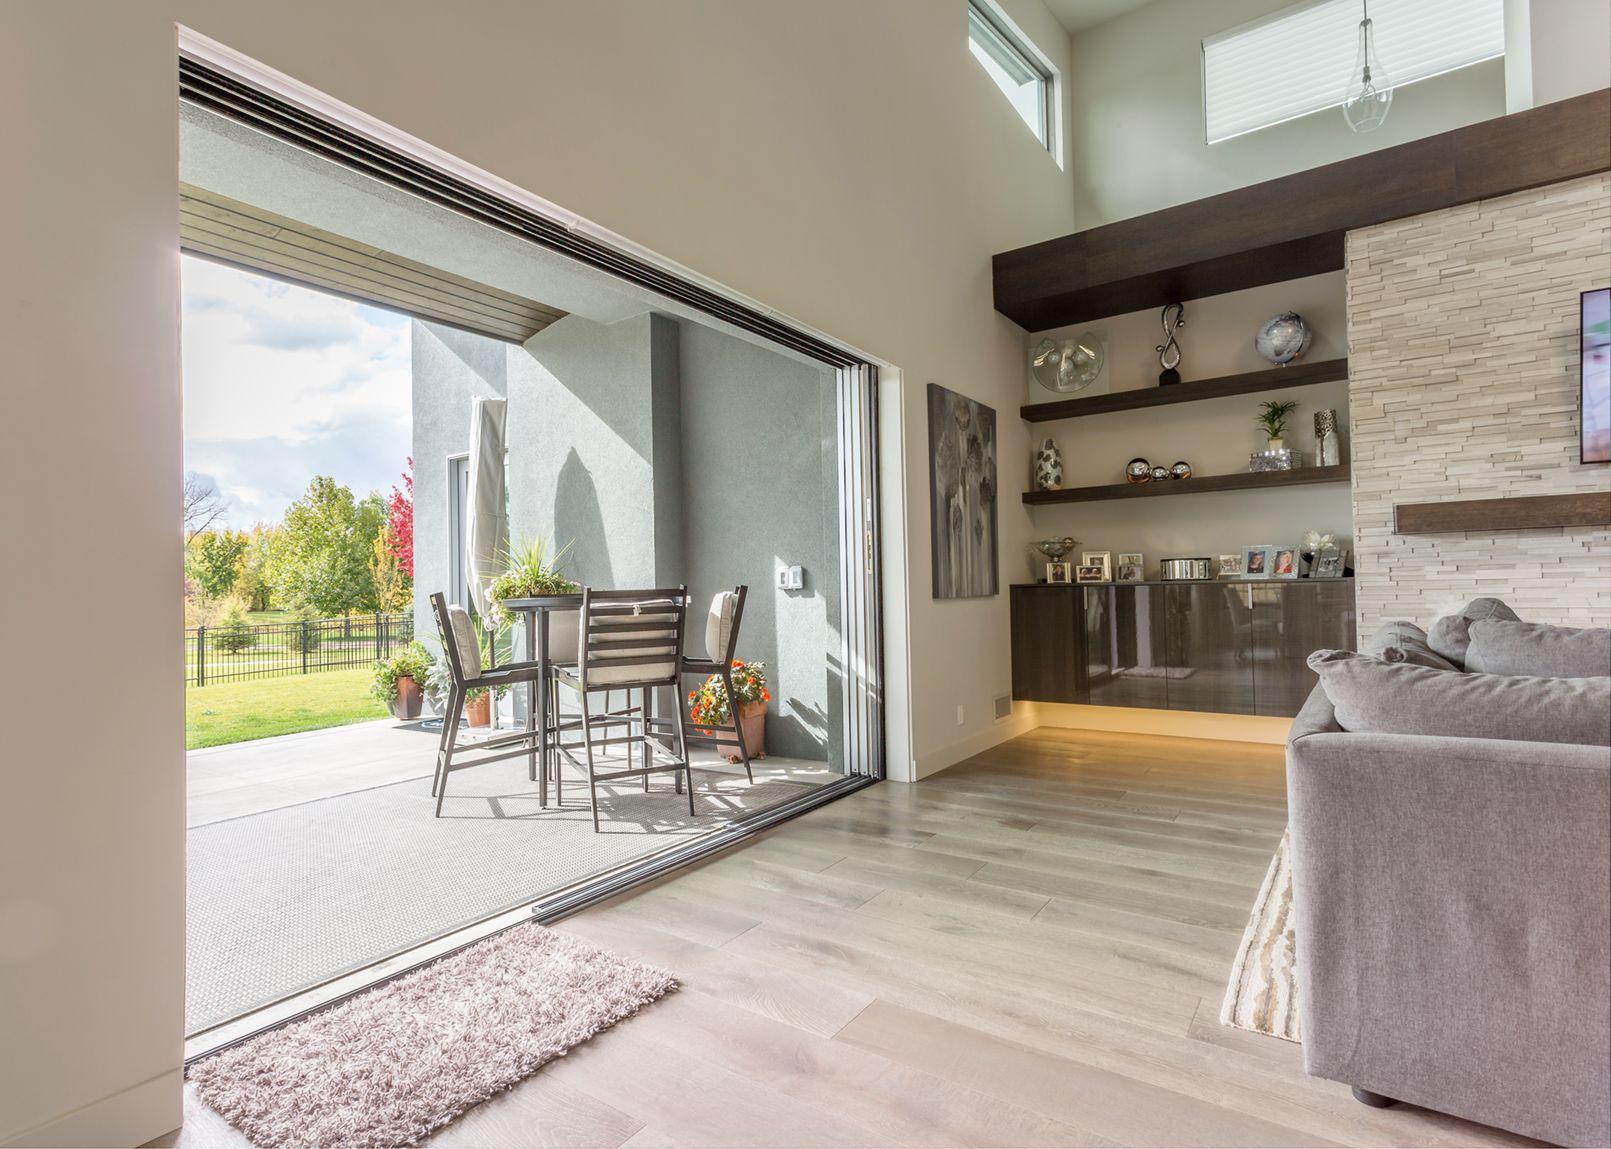 Windsor Pinnacle multi-slide patio door. | Patio Doors | Pinterest ...